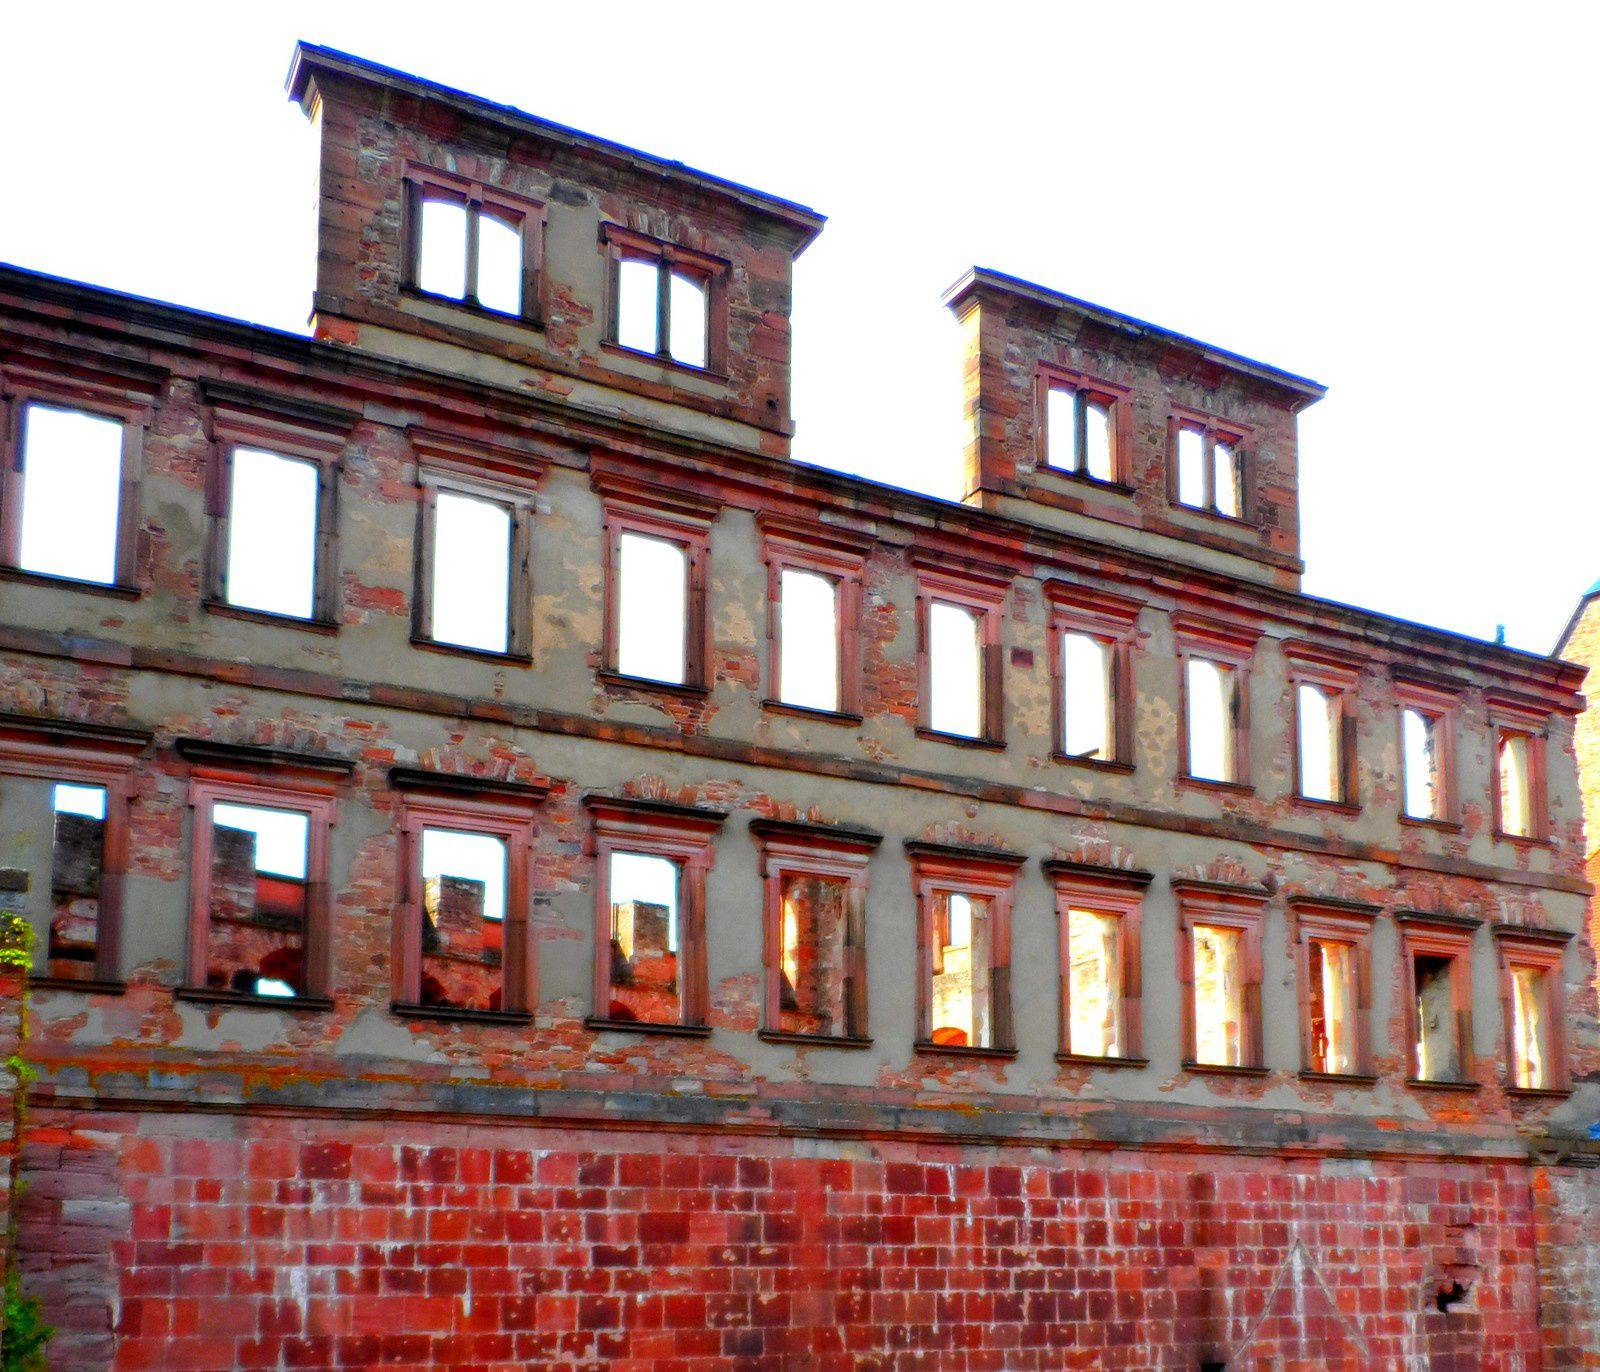 Heidelberg : château, internat, et Pignon